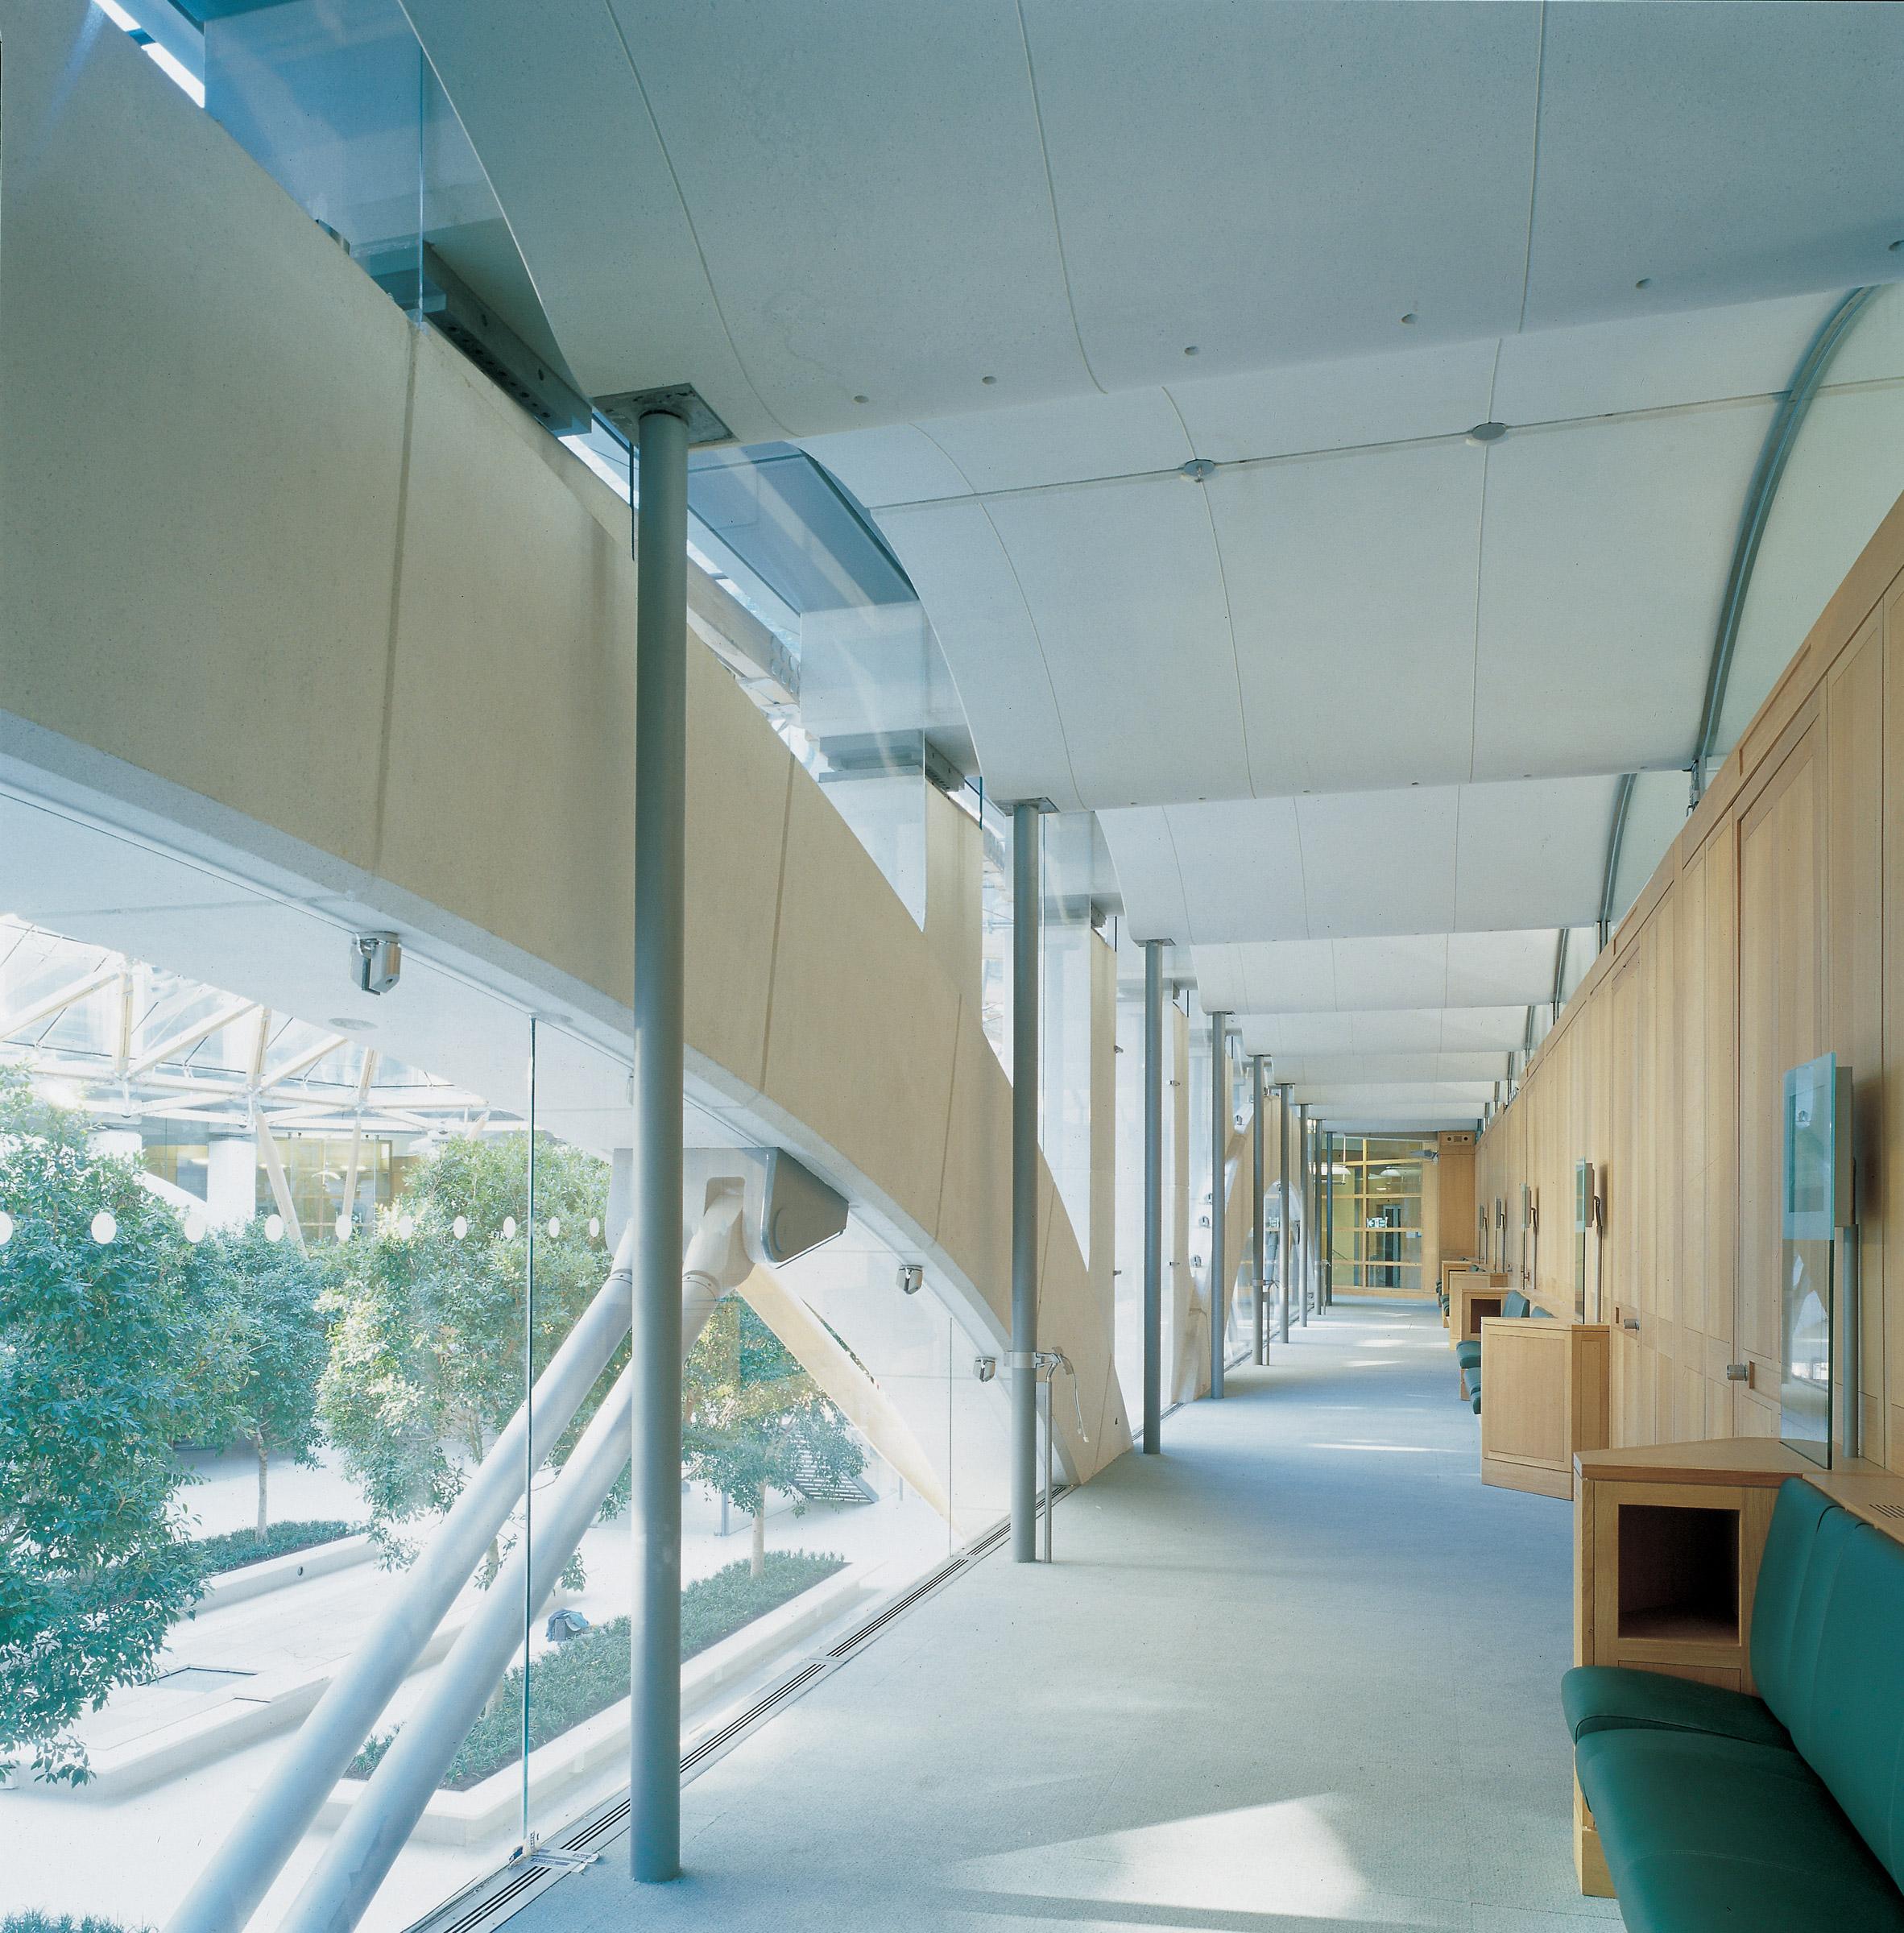 High-tech architecture guide: Portcullis House by Michael Hopkins